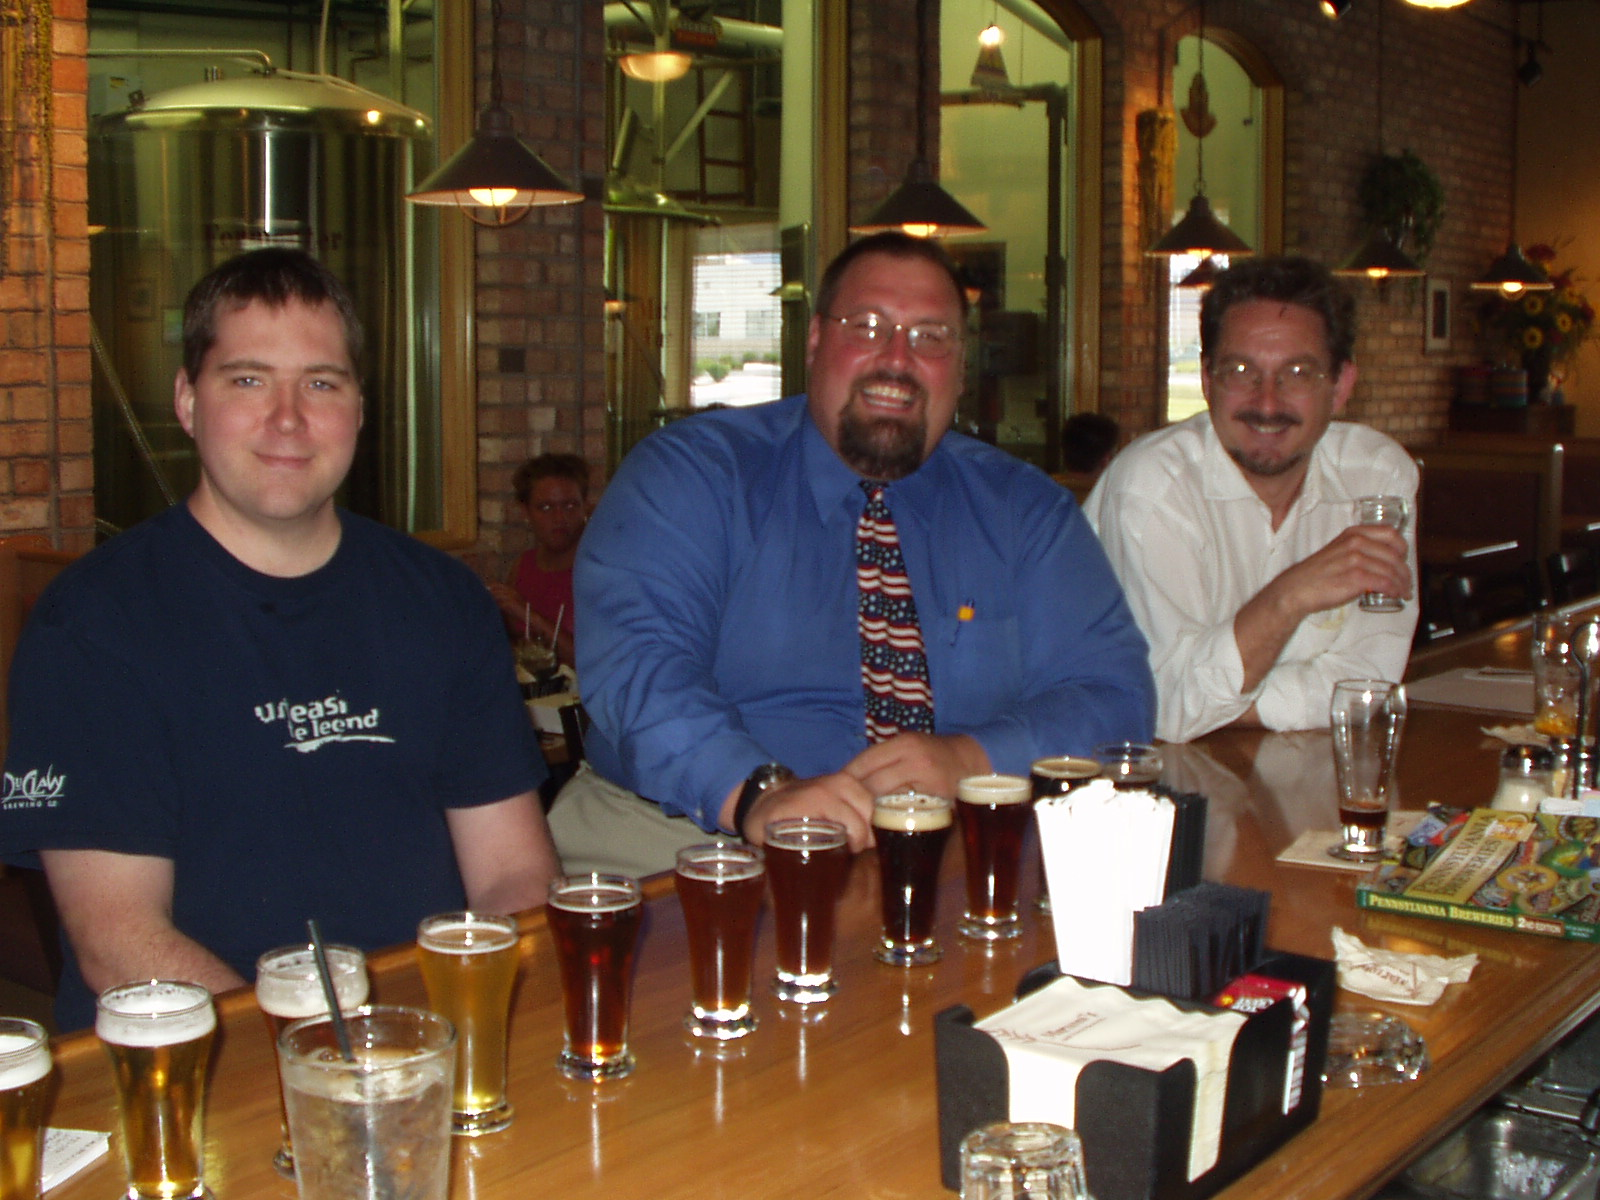 Marzoni's Brew Pub